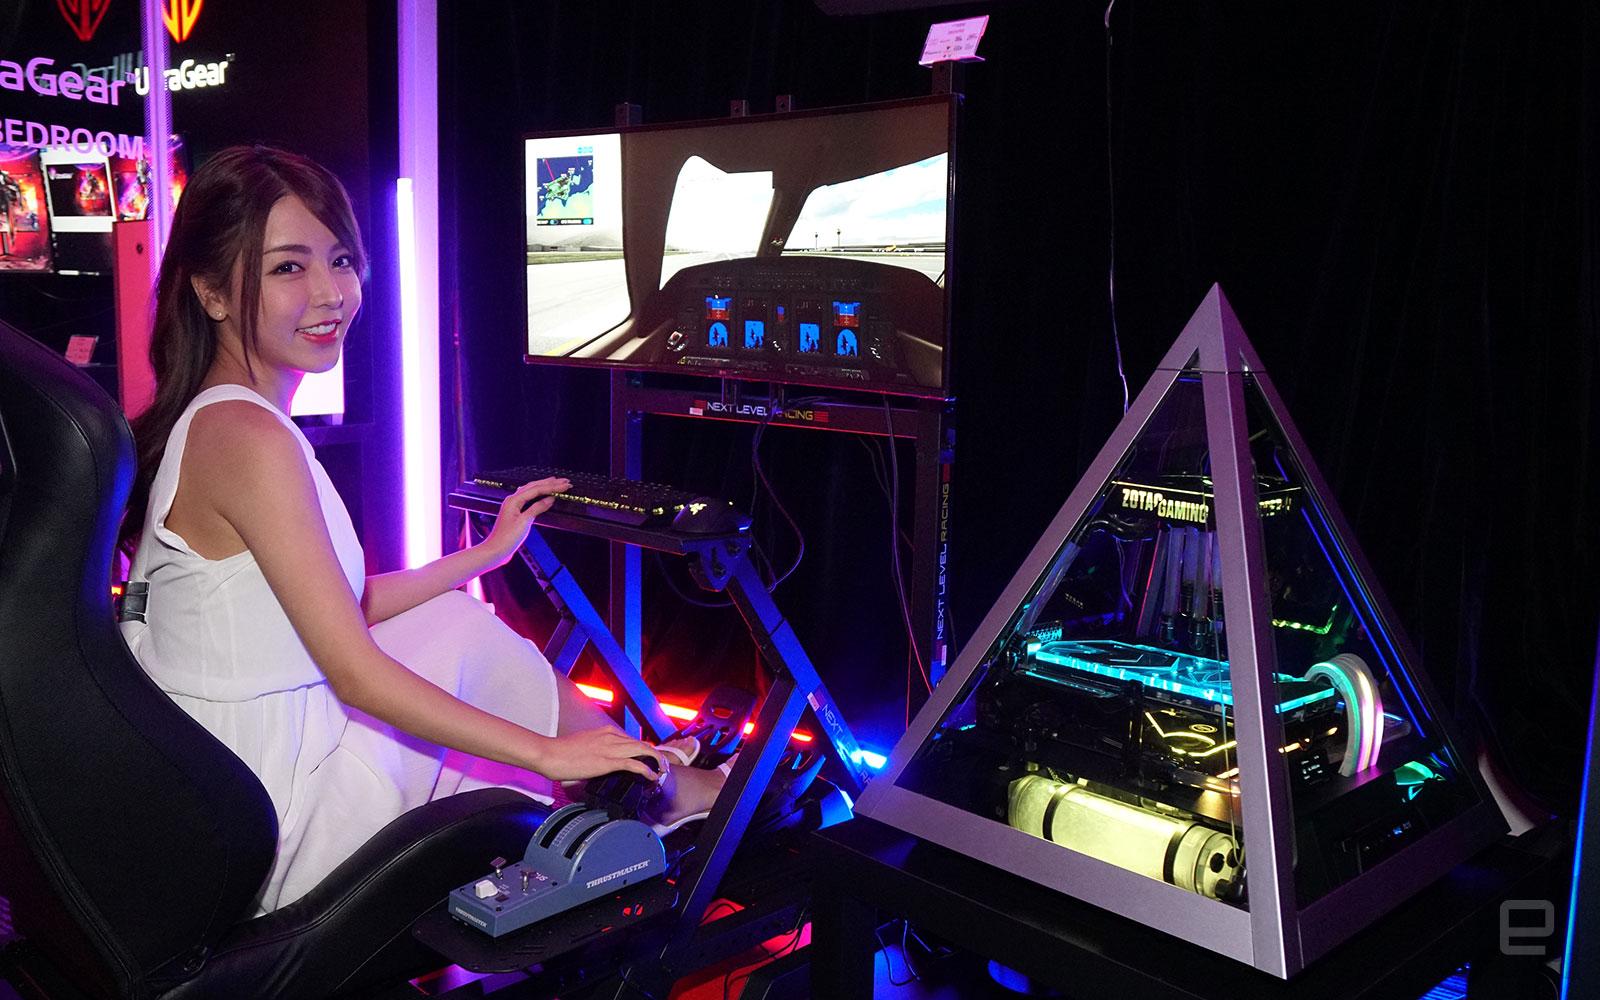 LG UltraGear 38GN950 電競螢幕 + Azza Pyramid 804 + Zotac RTX 2080 Ti ArcticStorm。